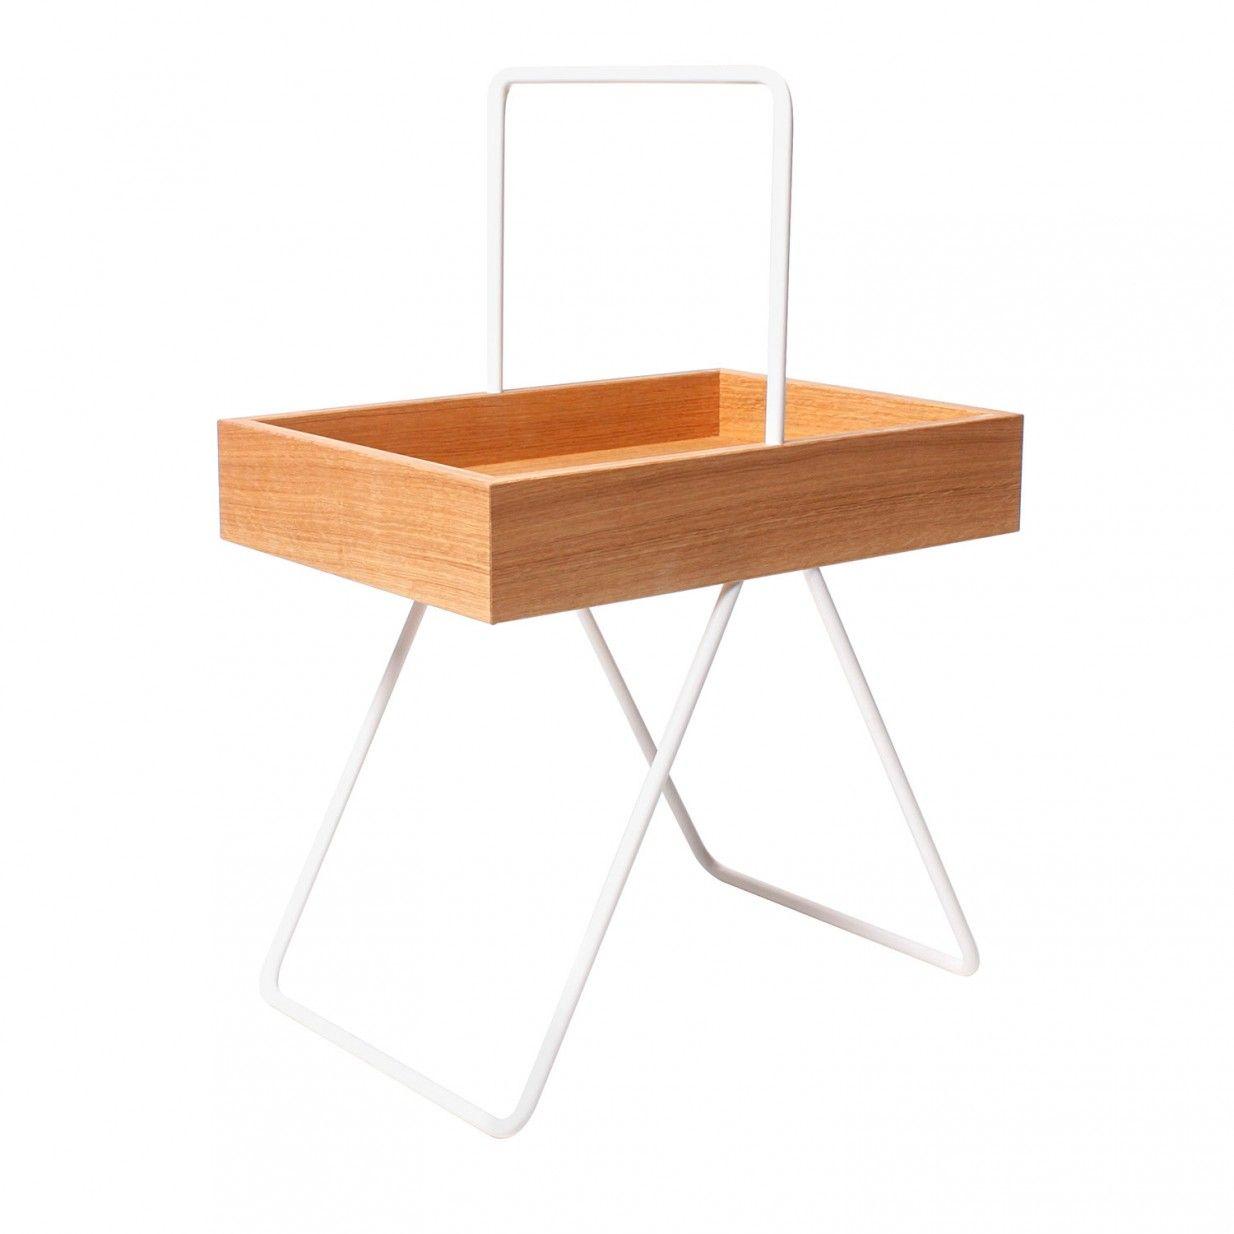 Charming Emil Beistelltisch/Tablett | Side By Side Design Inspirations